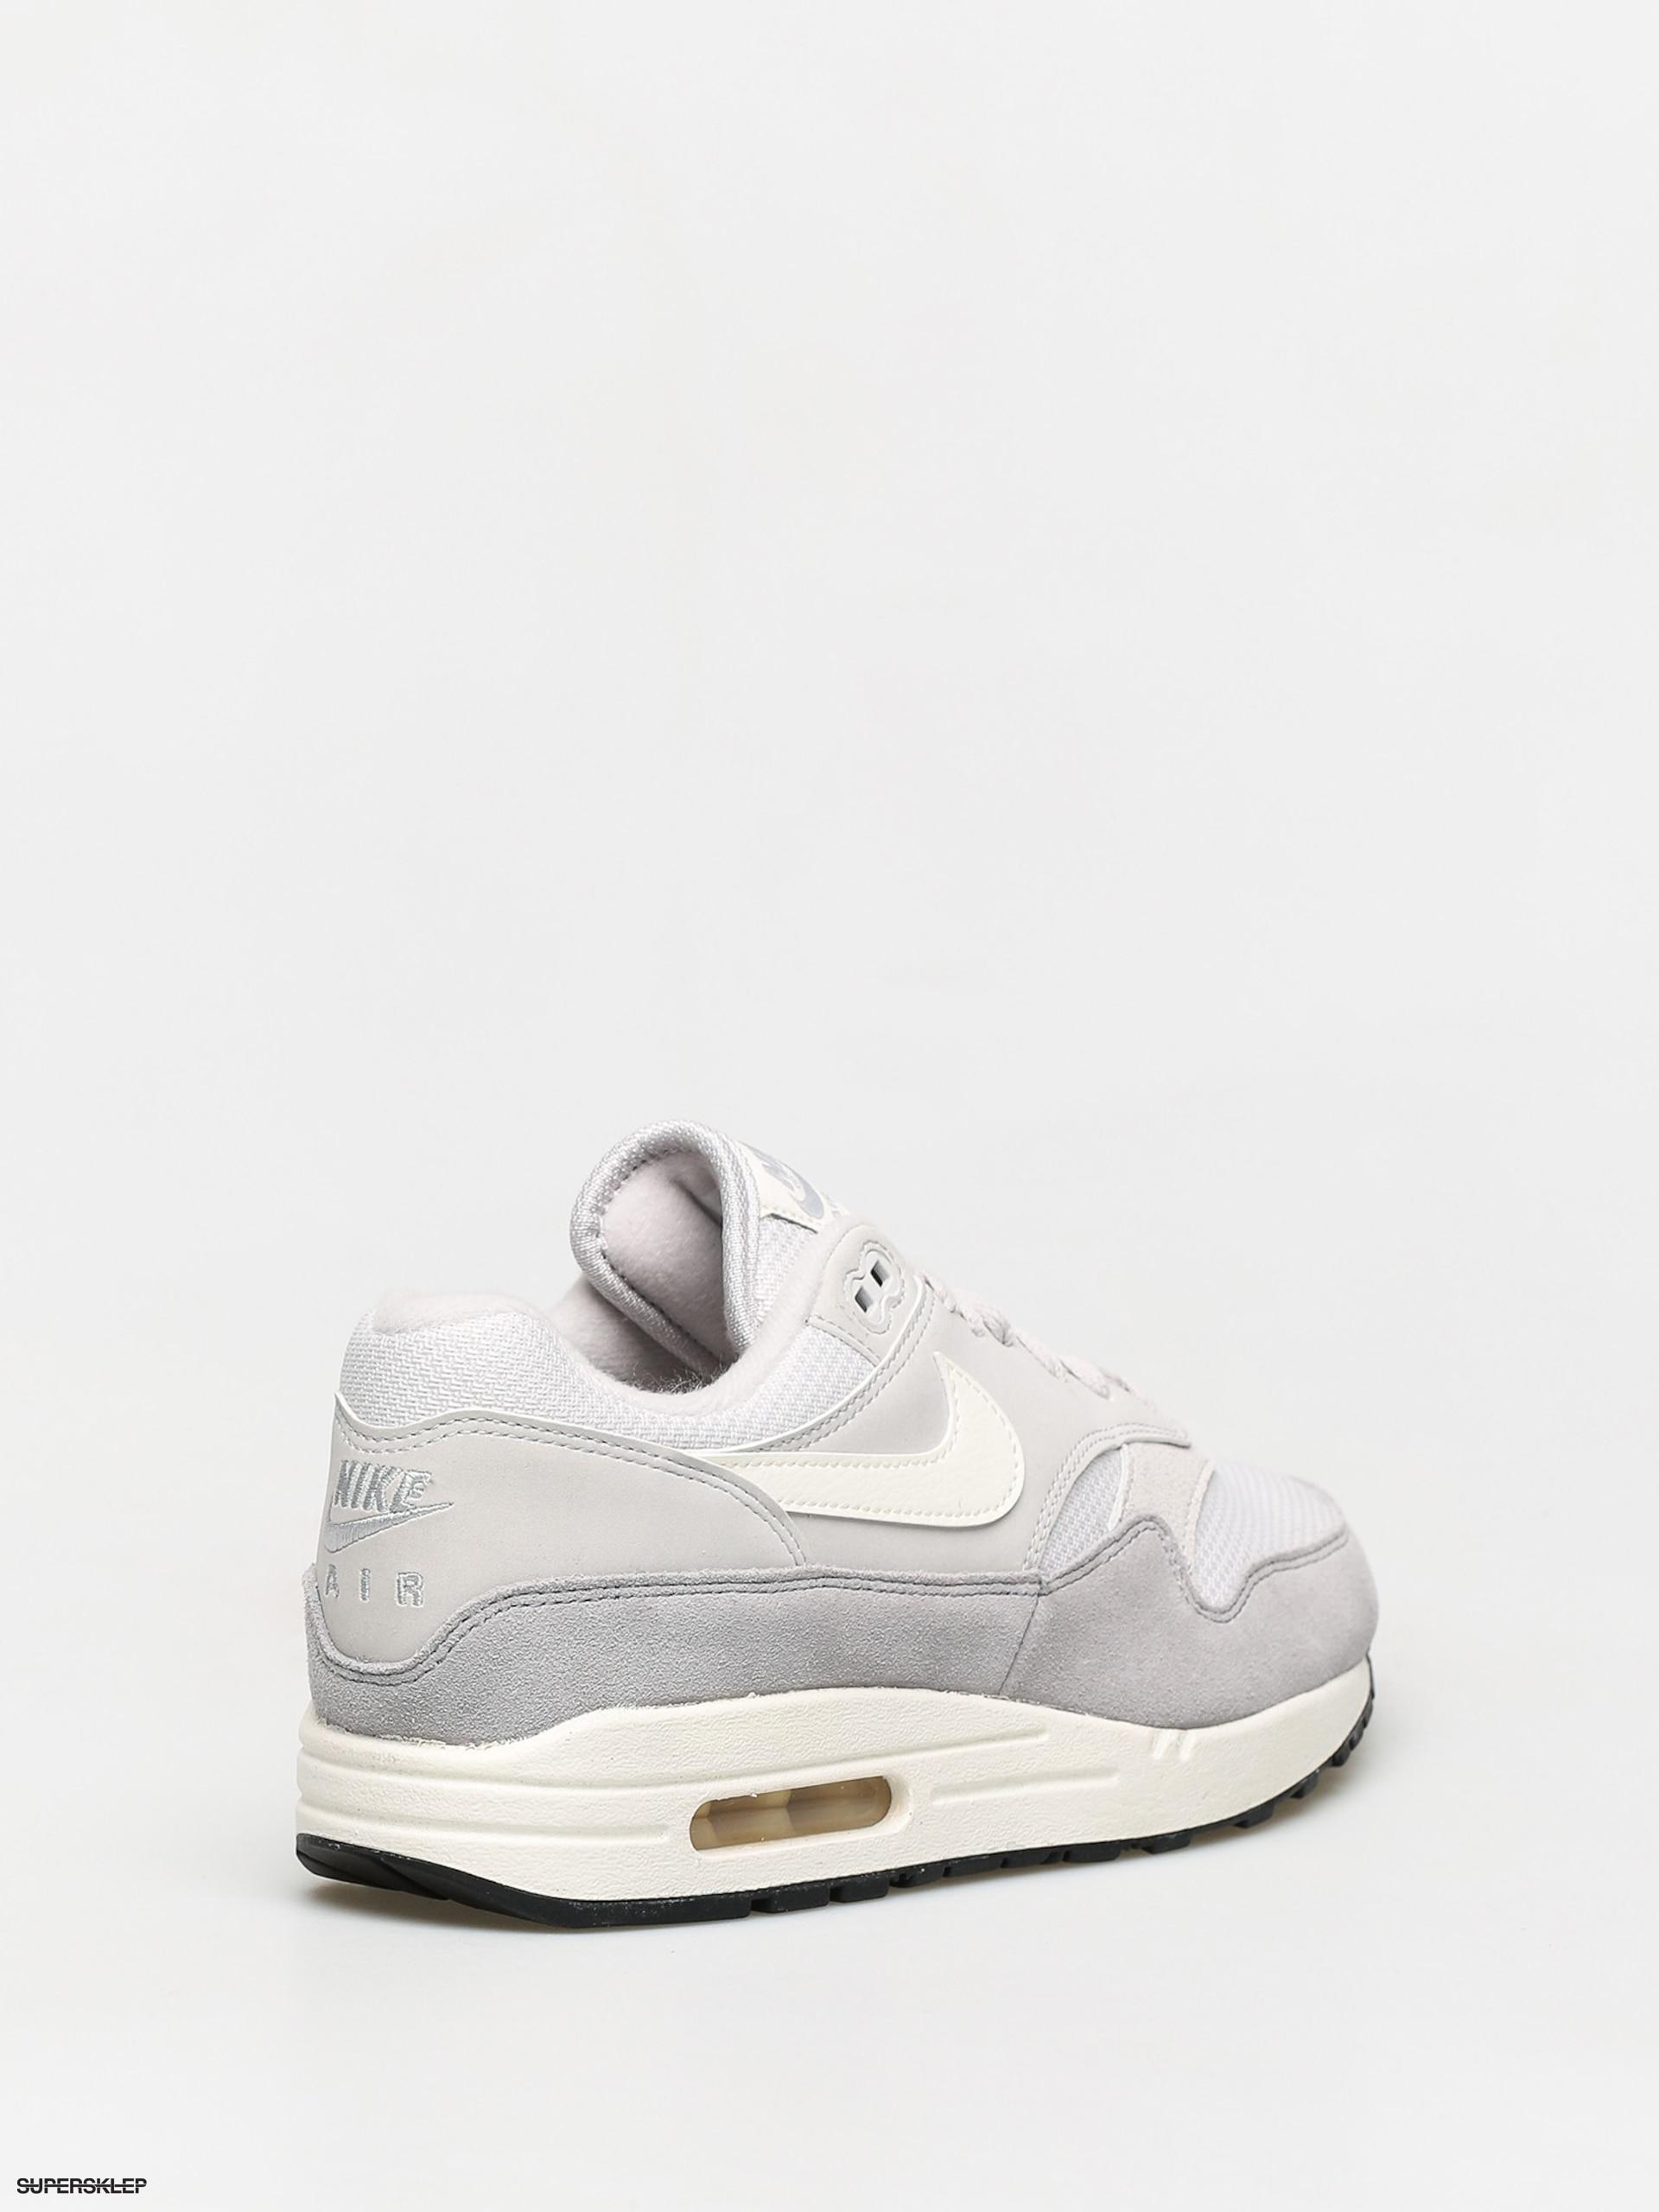 Sneakers buty Nike Air Max 1 vast grey sail sail wolf grey (AH8145 011)